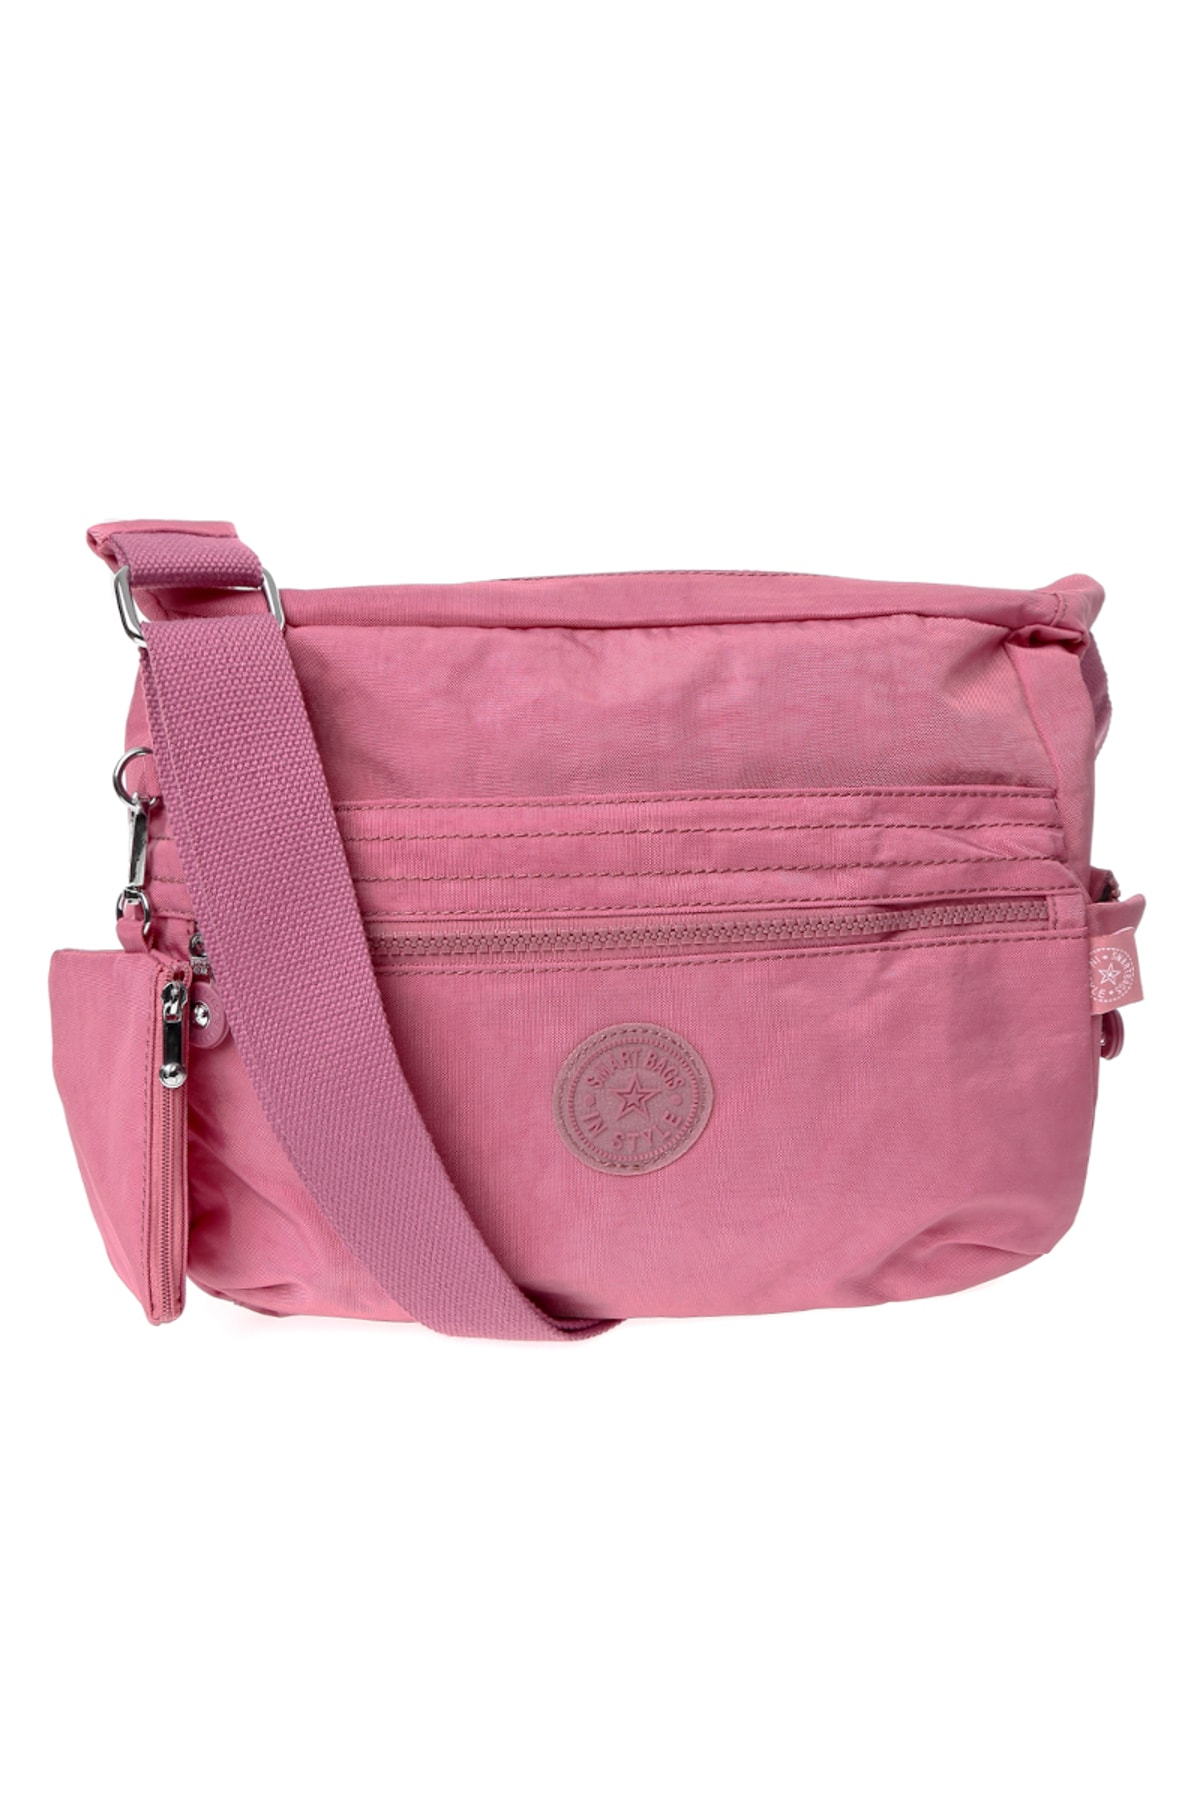 SMART BAGS Pembe Kadın Çanta 1